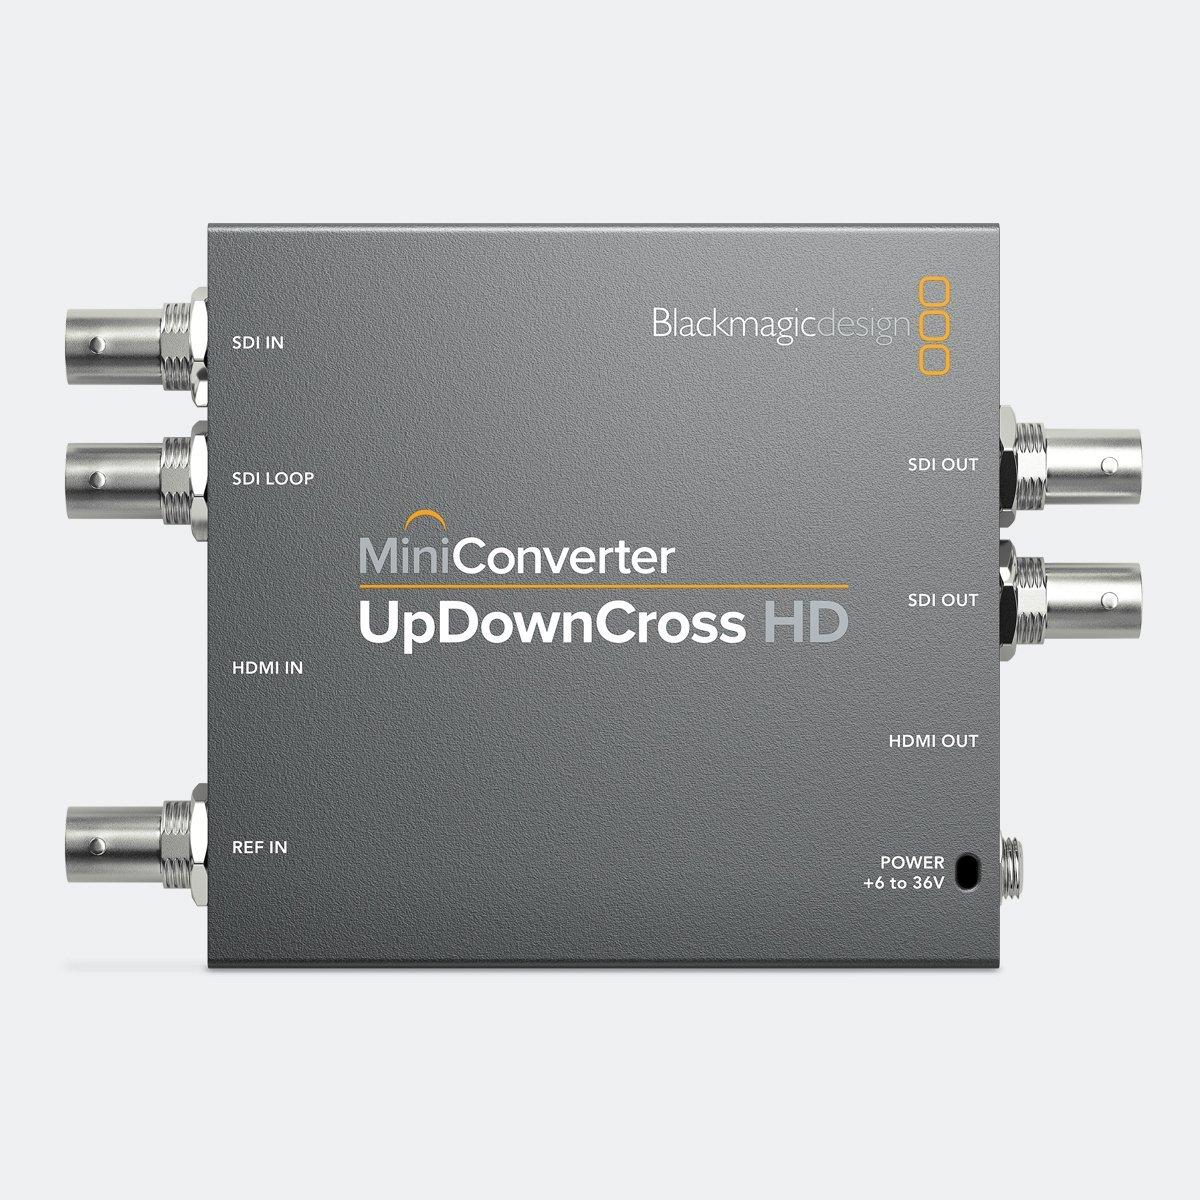 Ex-Demo Blackmagic UpDownCross mini converter